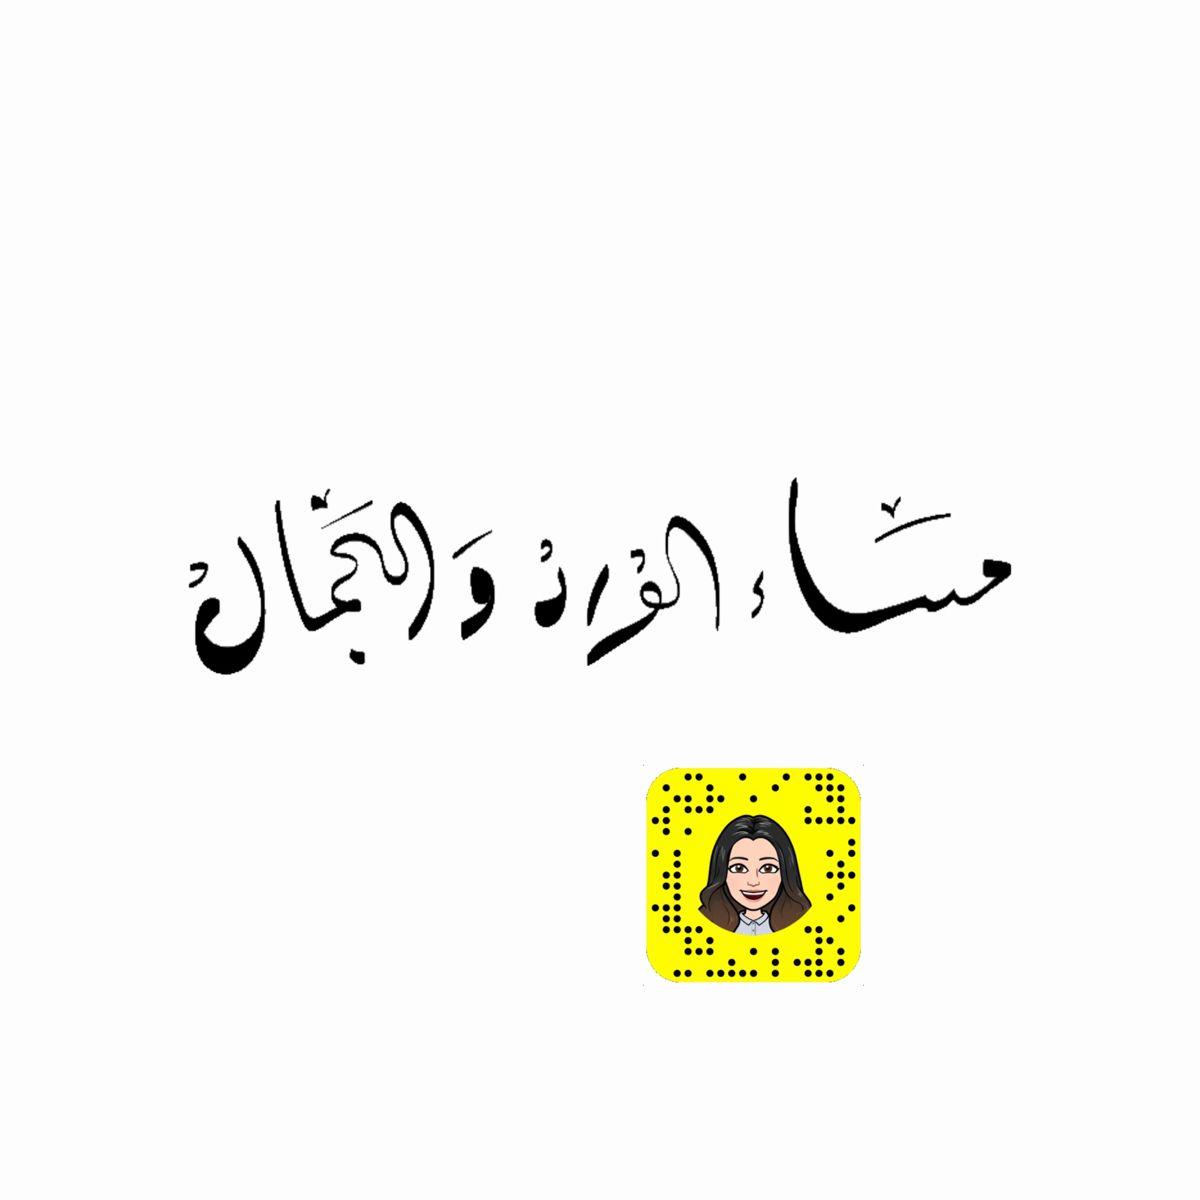 سناب C82il Arabic Calligraphy Calligraphy